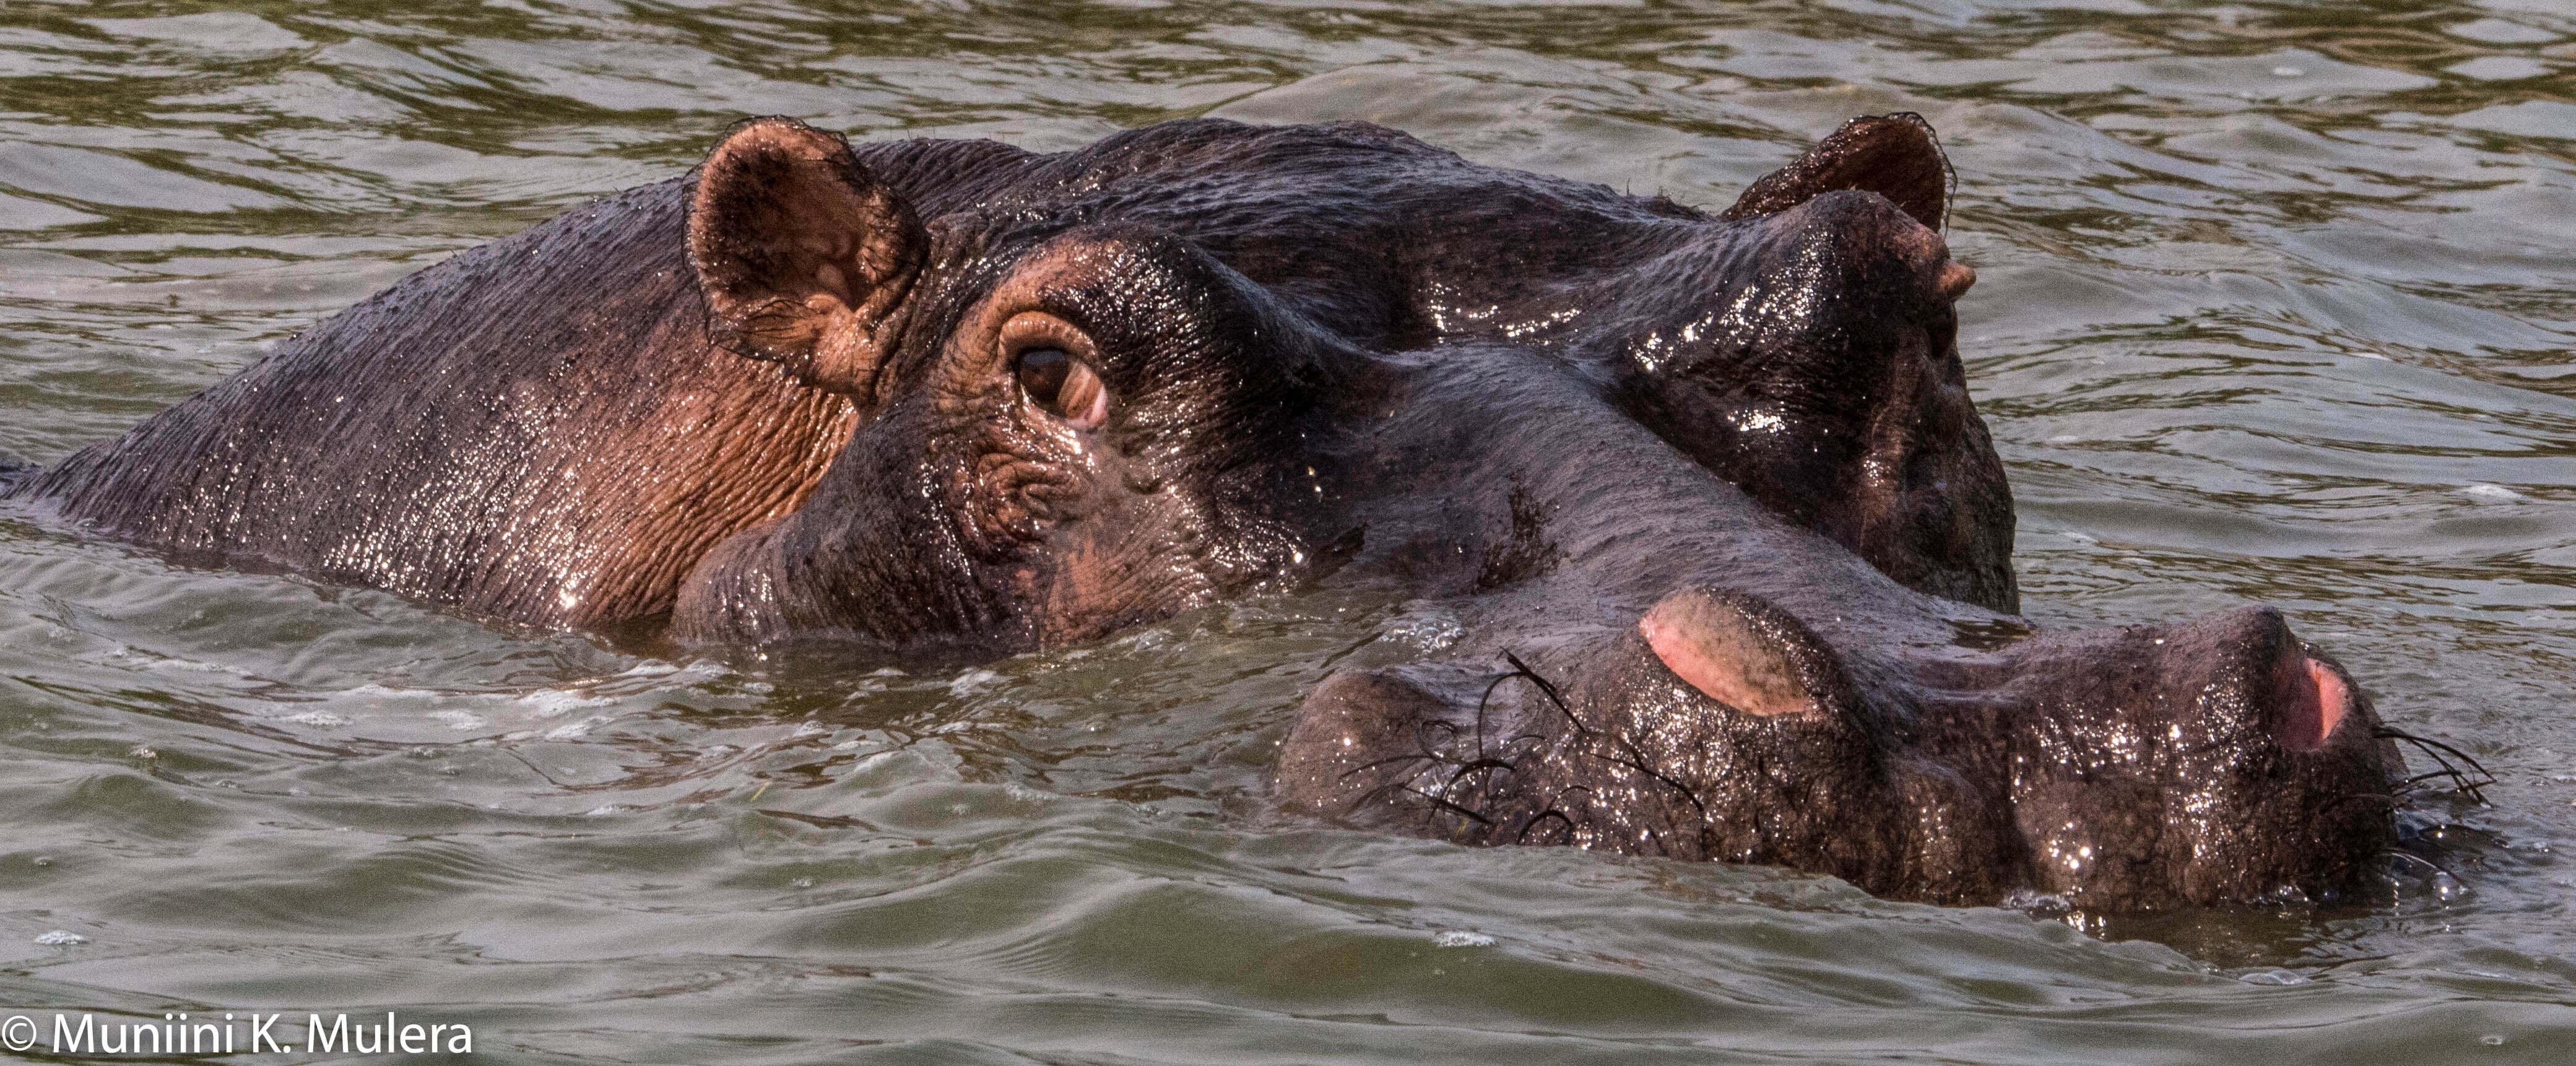 Hippo - Kazinga Chanel, Rwenzori National Park, Uganda-1-3